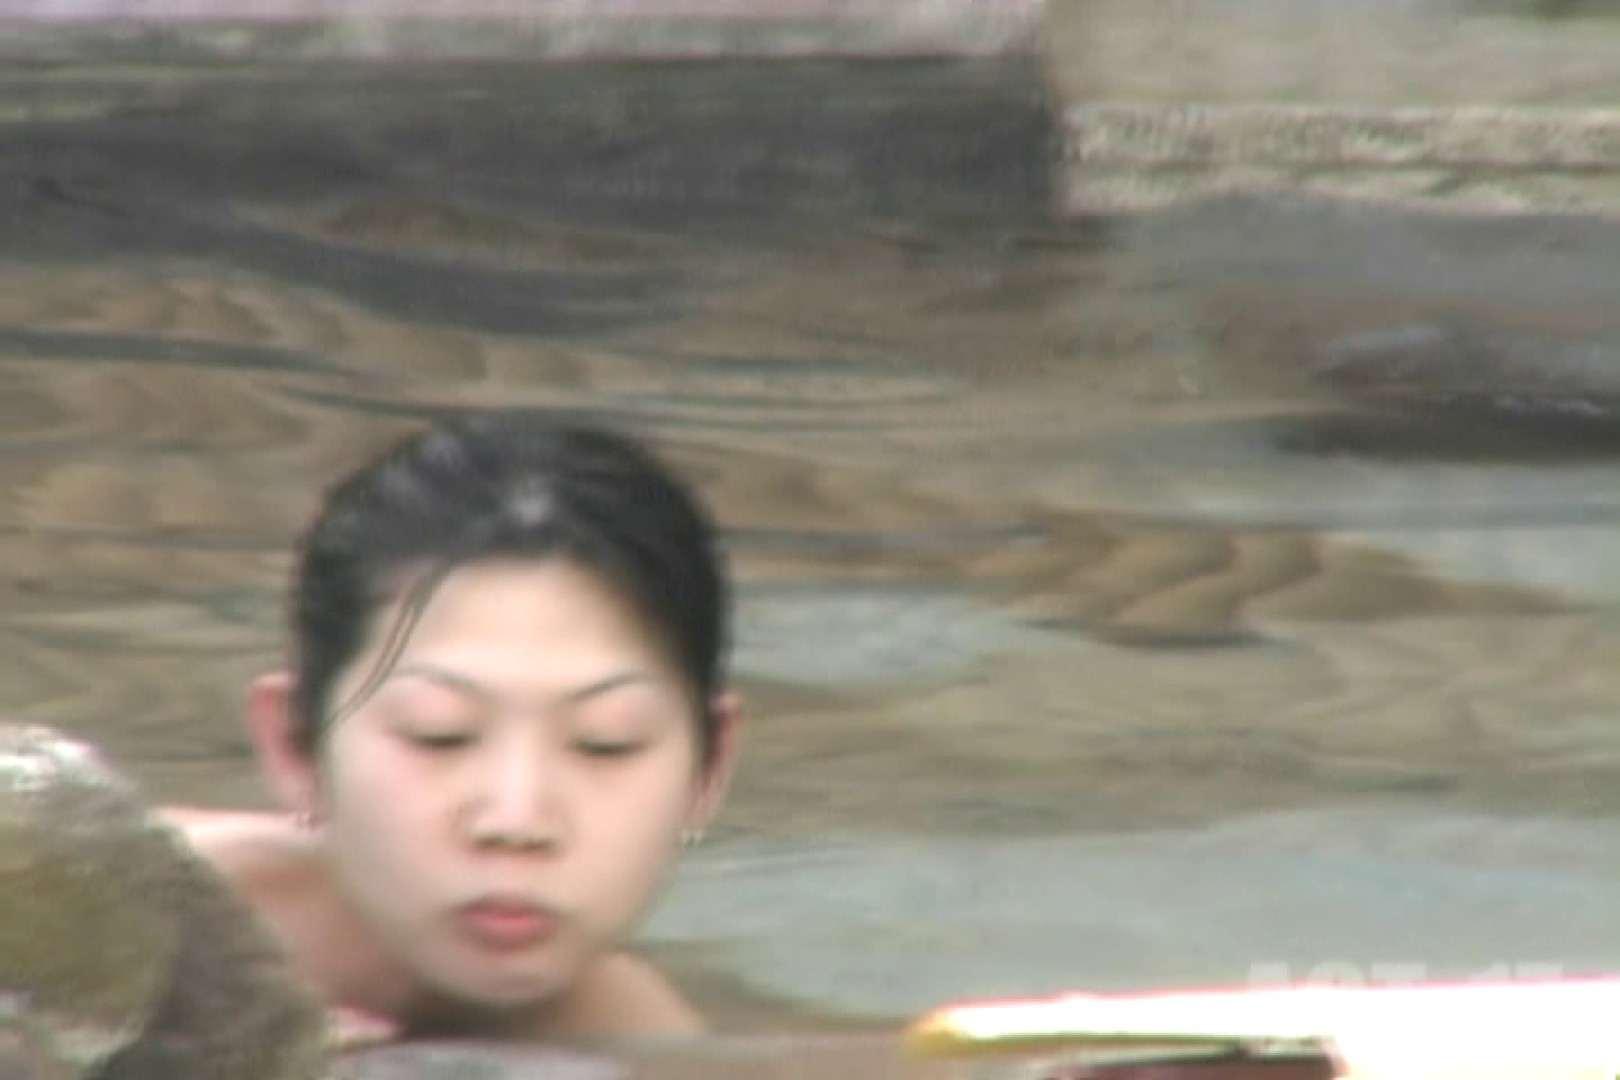 Aquaな露天風呂Vol.850 盗撮 AV無料動画キャプチャ 76連発 38